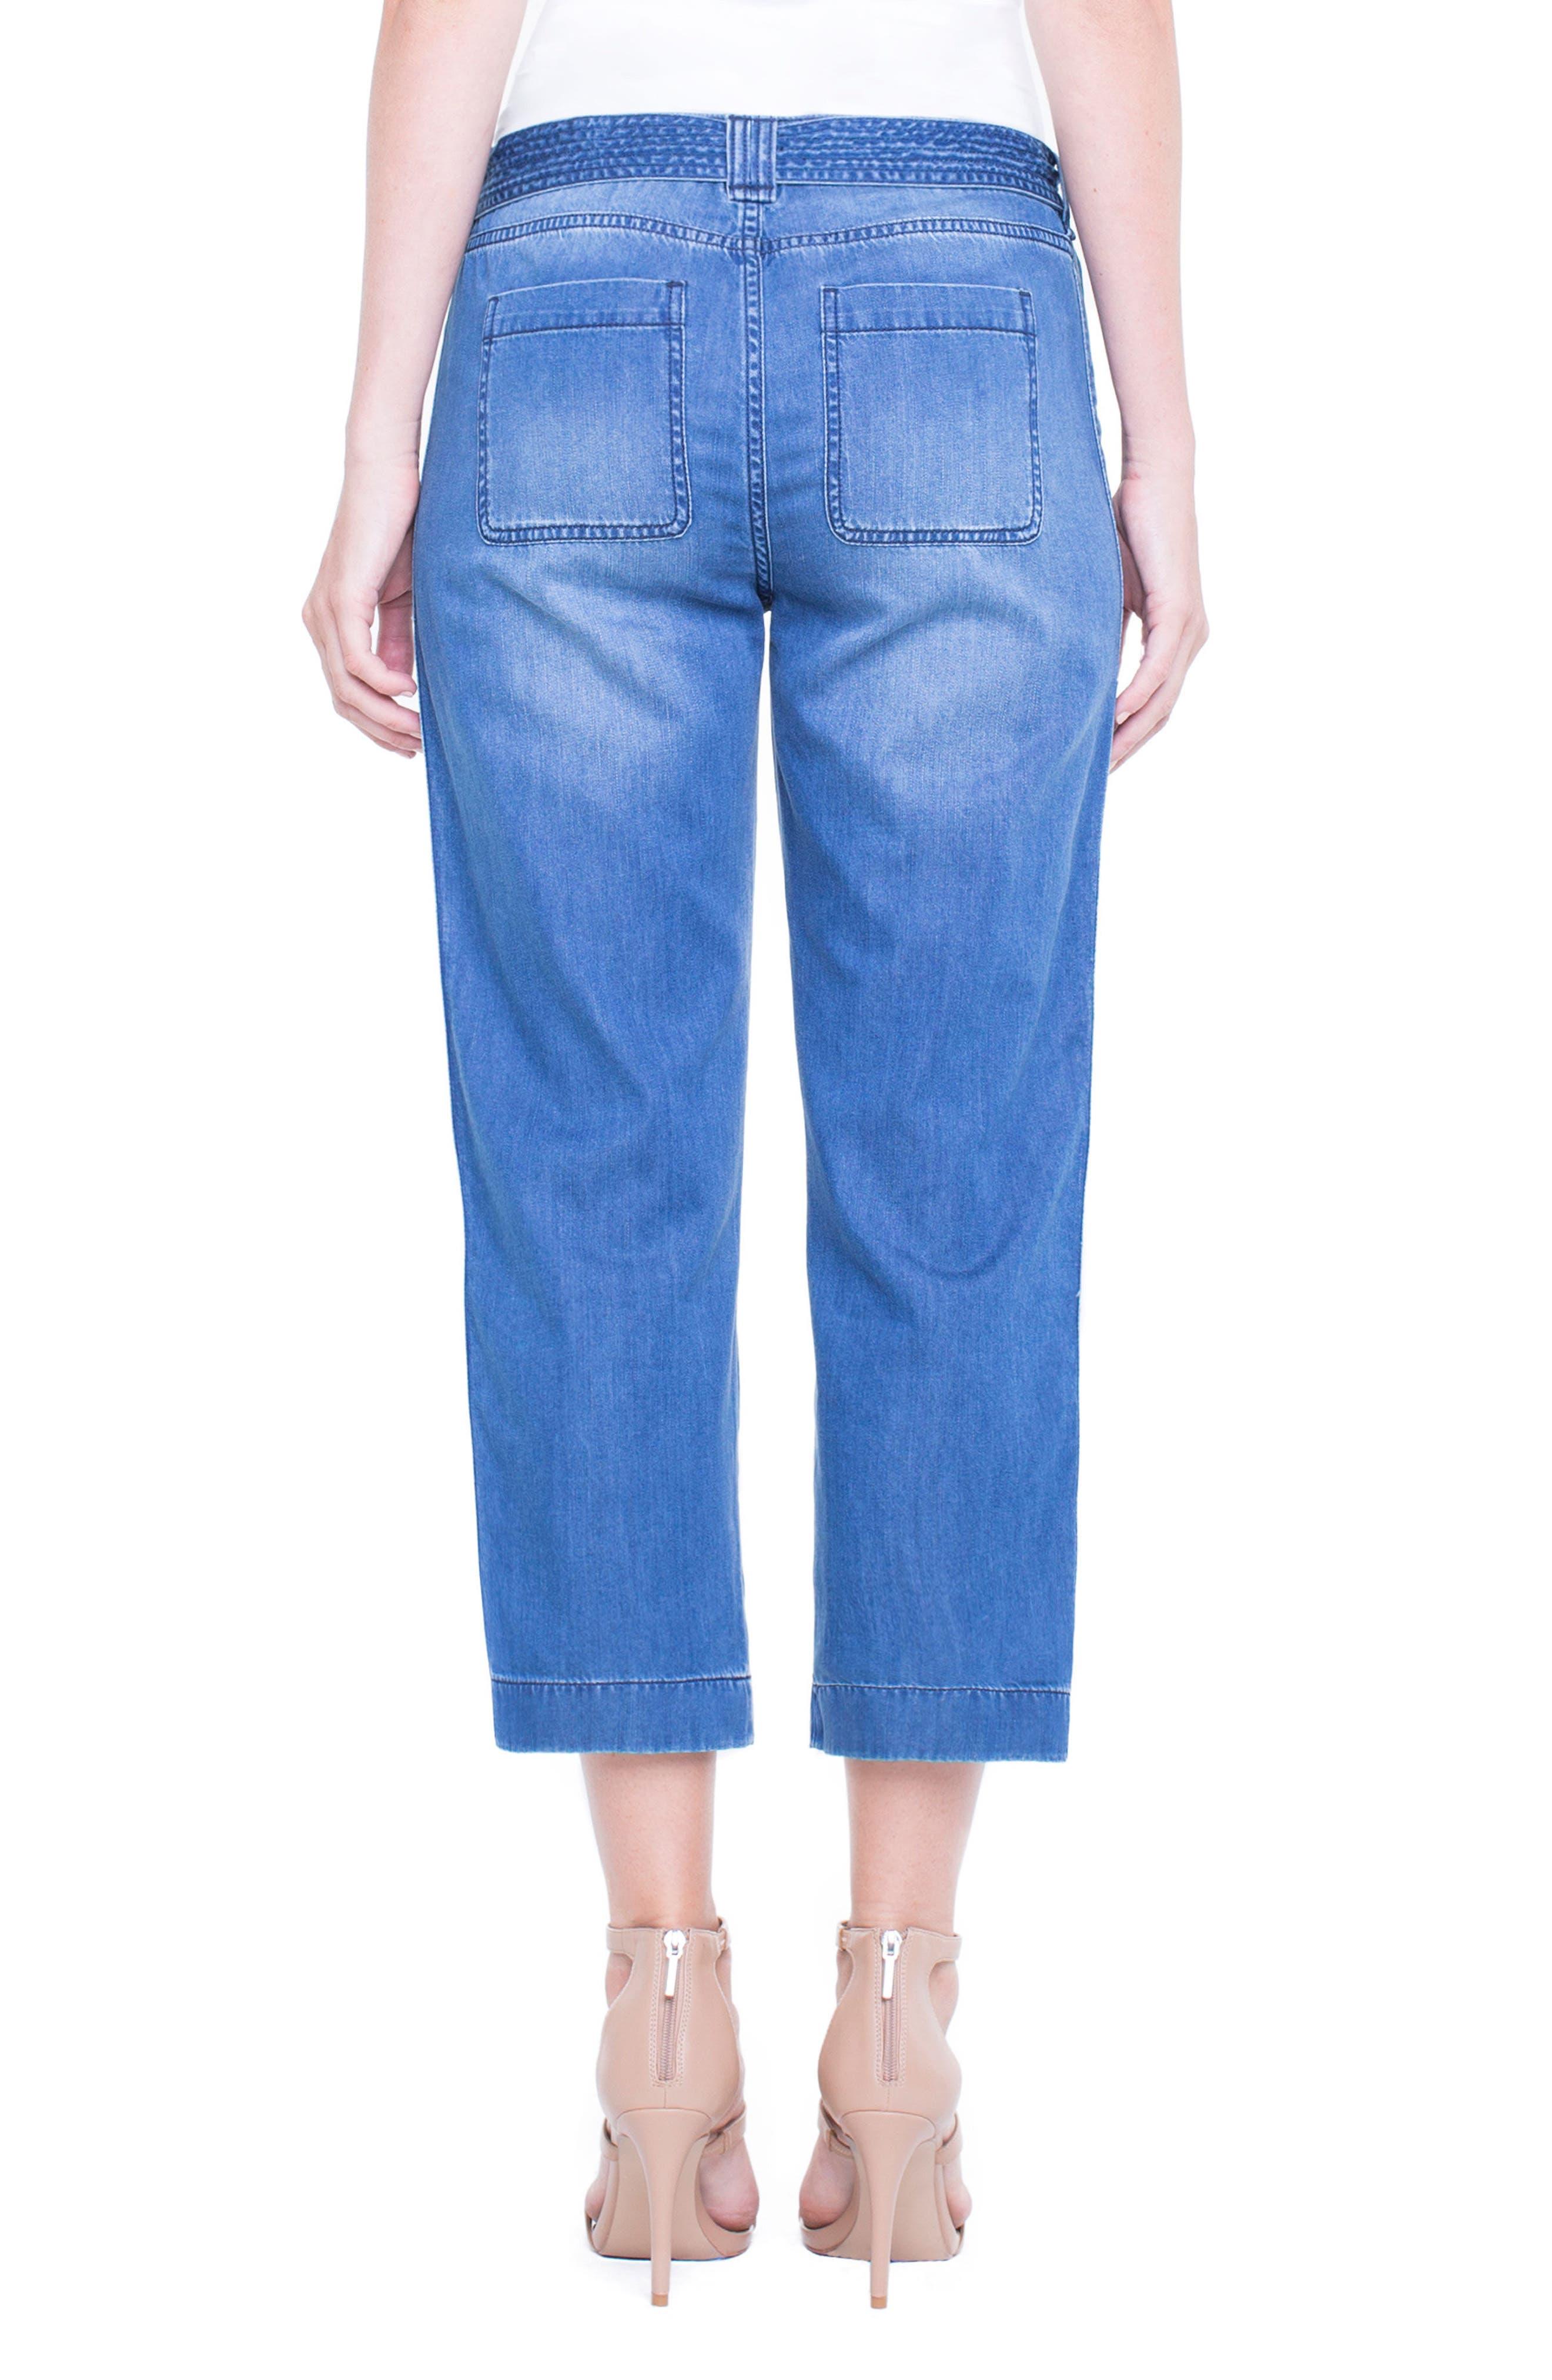 Norah Capri Jeans,                             Alternate thumbnail 3, color,                             Belfast Hand Sand